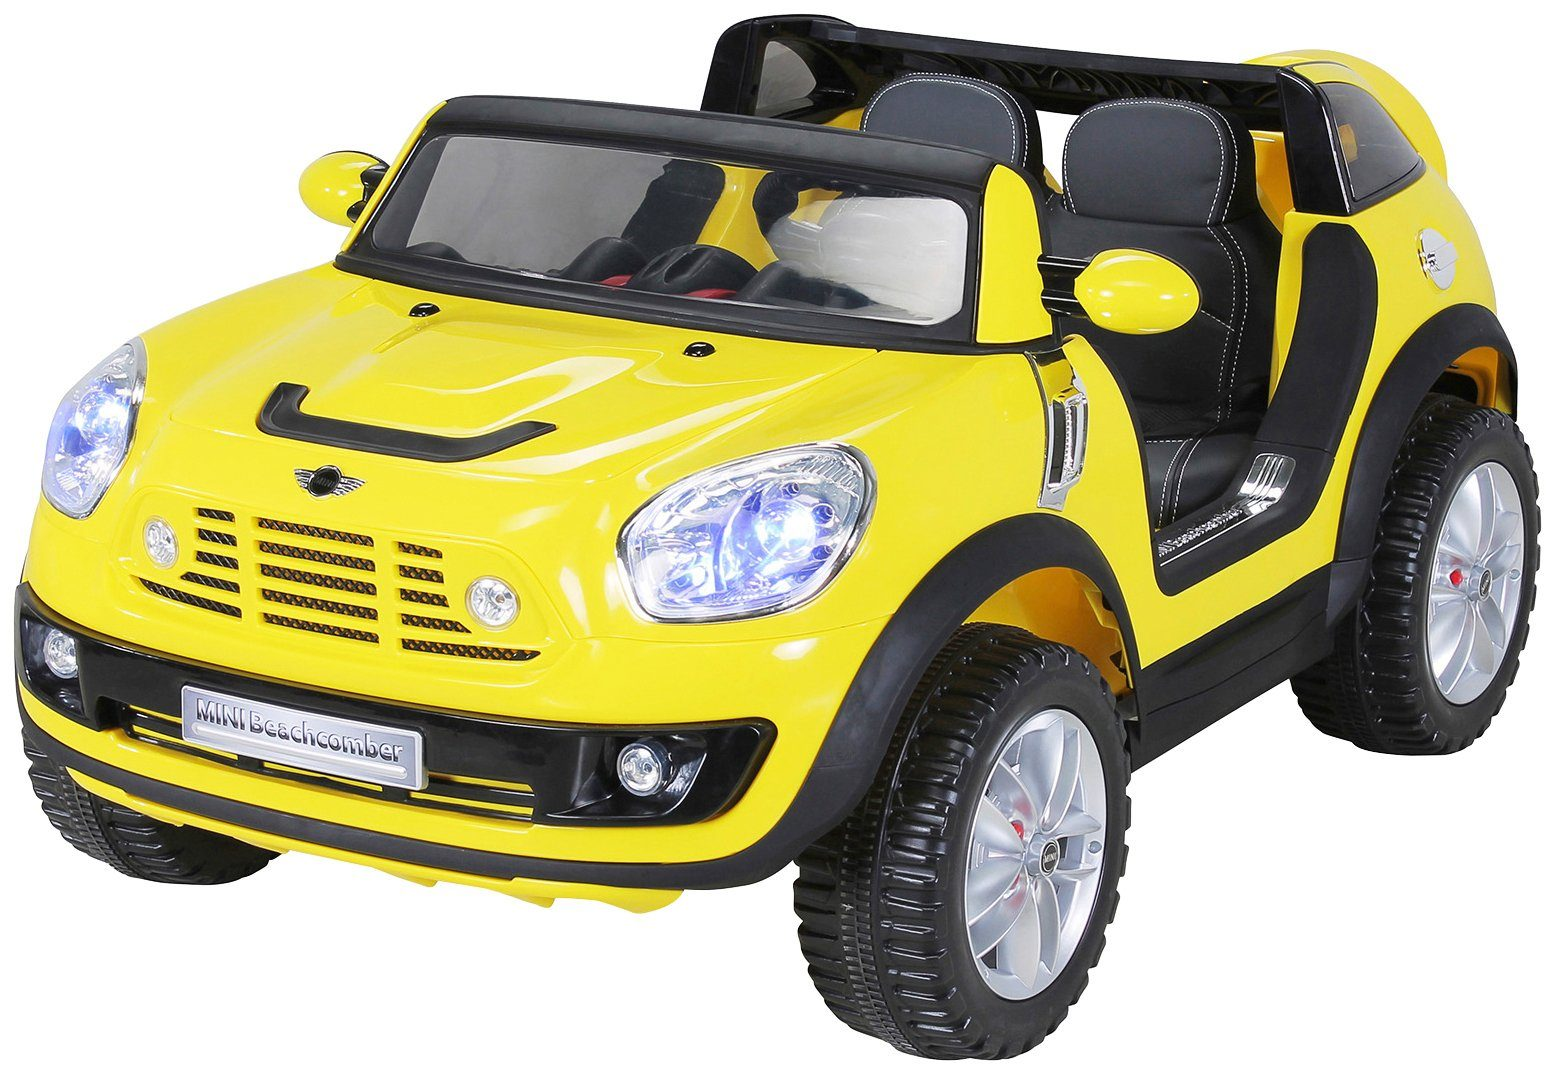 ACTIONBIKES MOTORS Elektroauto »BMW Mini Beachcomber XXL«, für Kinder ab 3 Jahre, 12 Volt